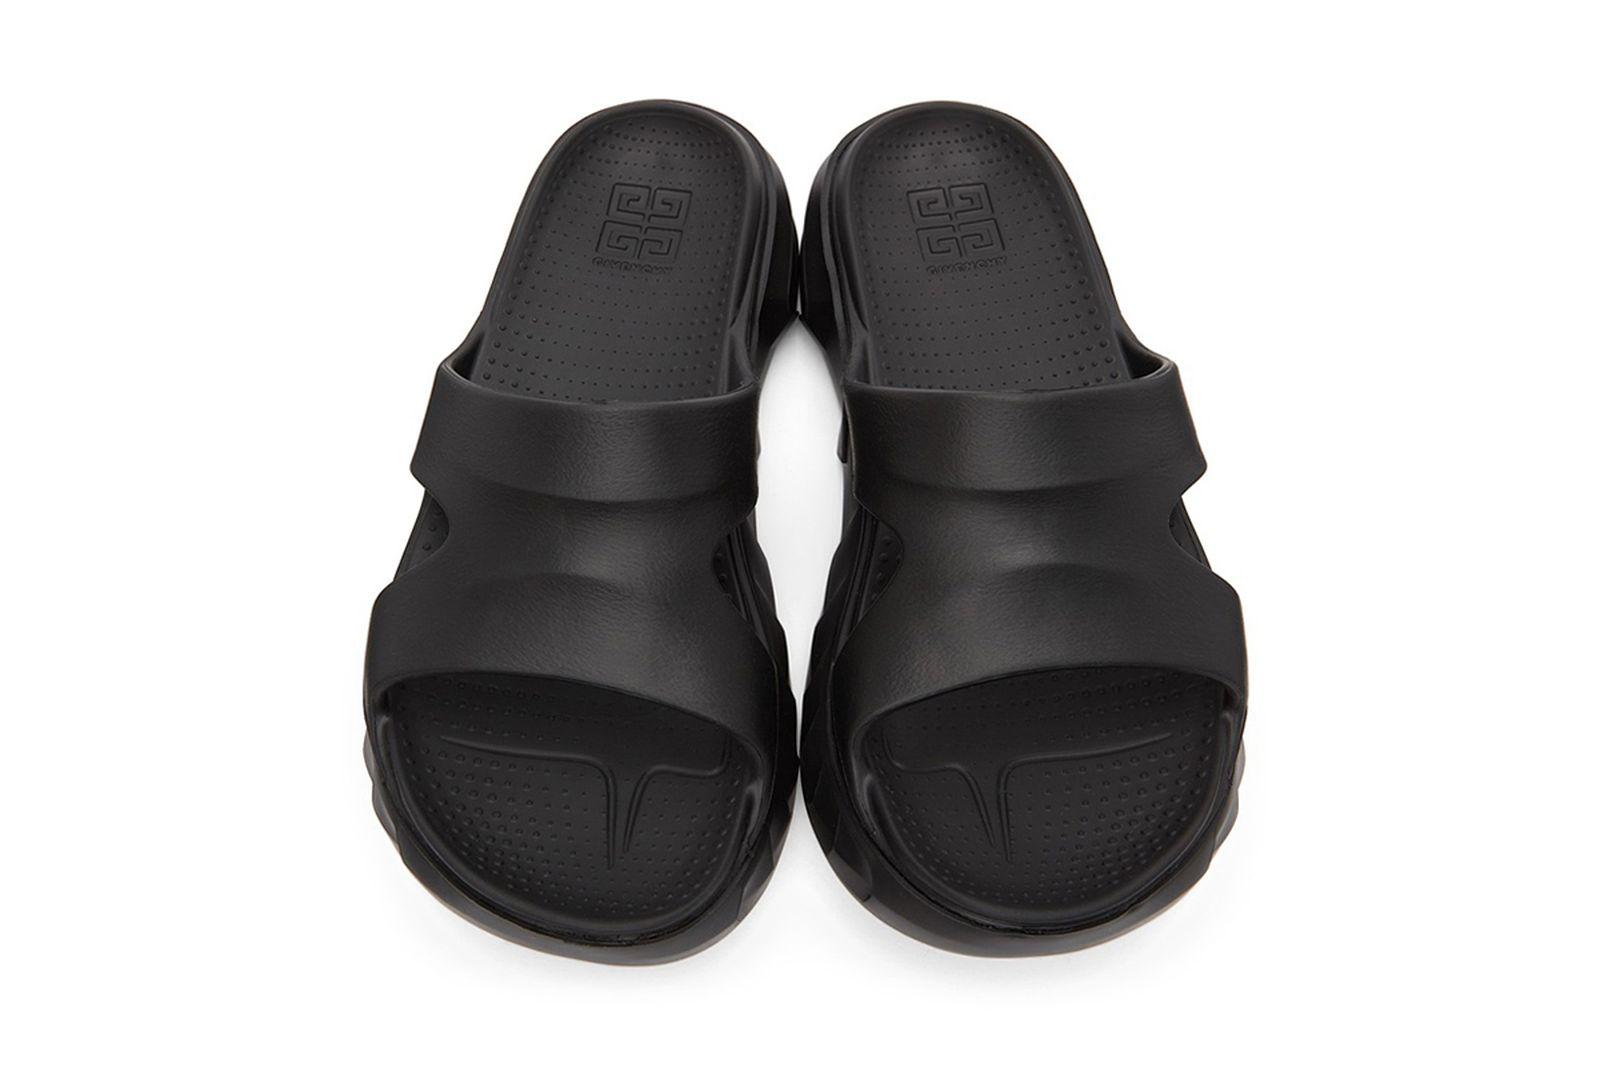 balenciaga-givenchy-molded-sandals- (3)